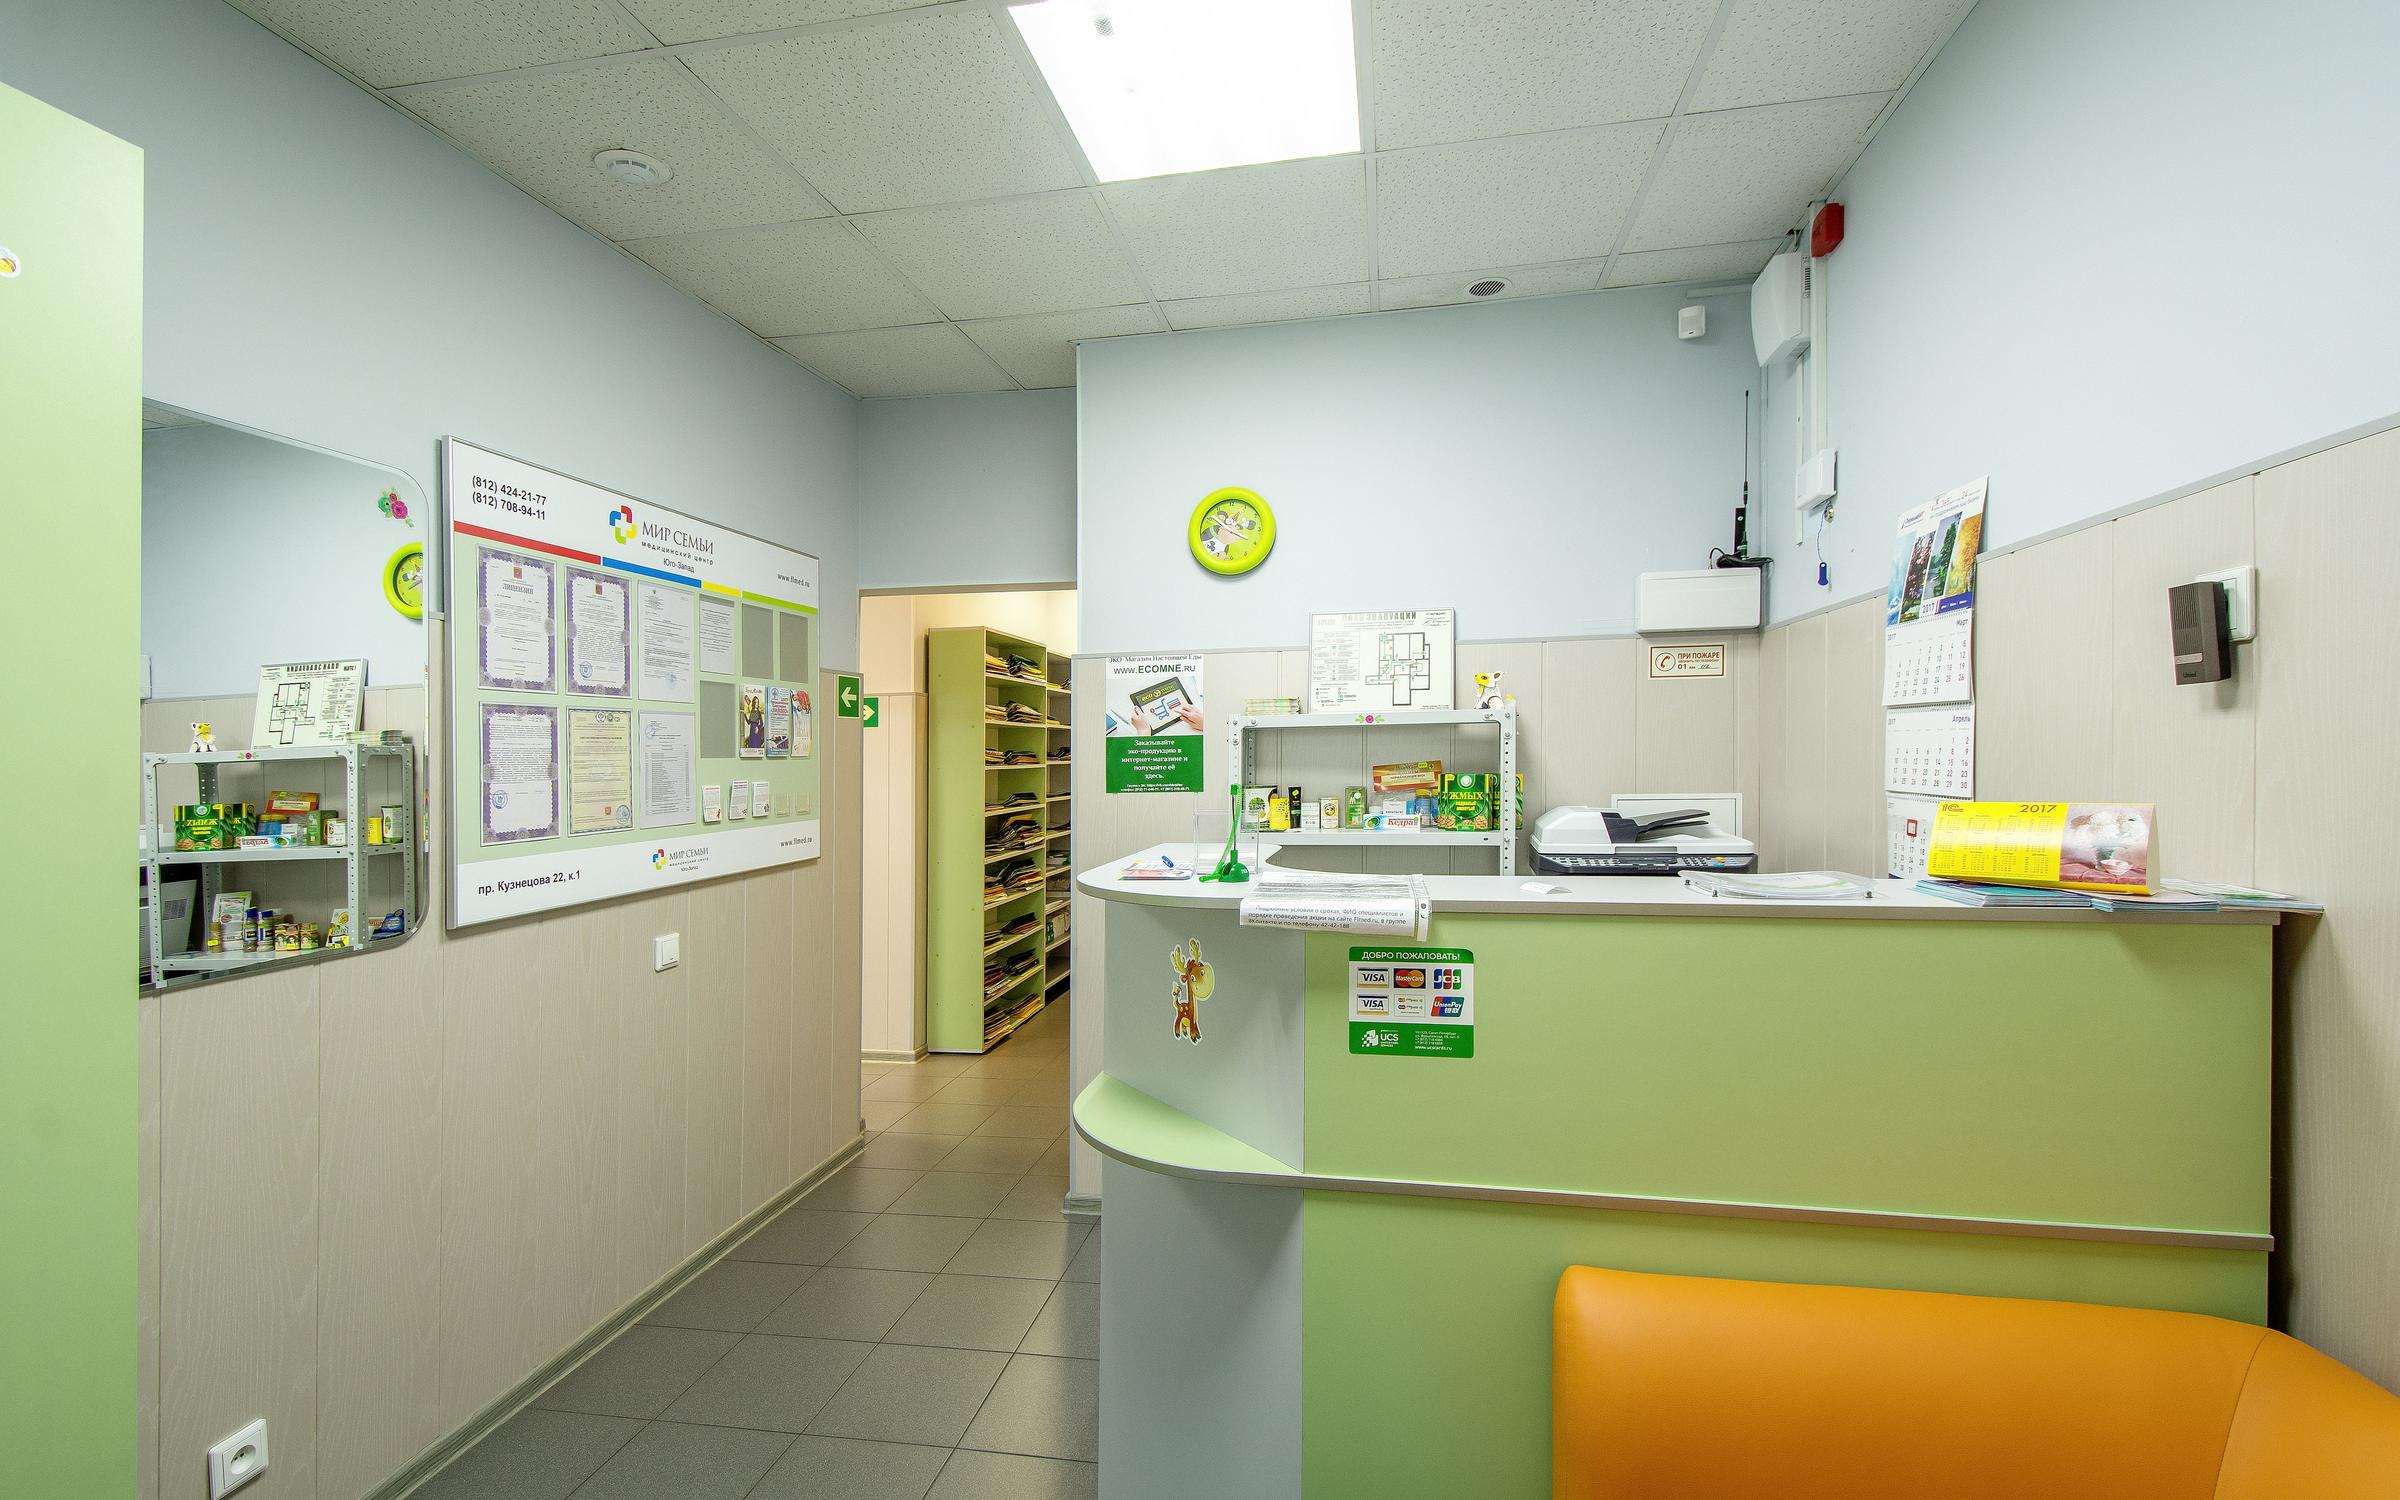 фотография Клиники Мир семьи Юго-Запад на проспекте Кузнецова